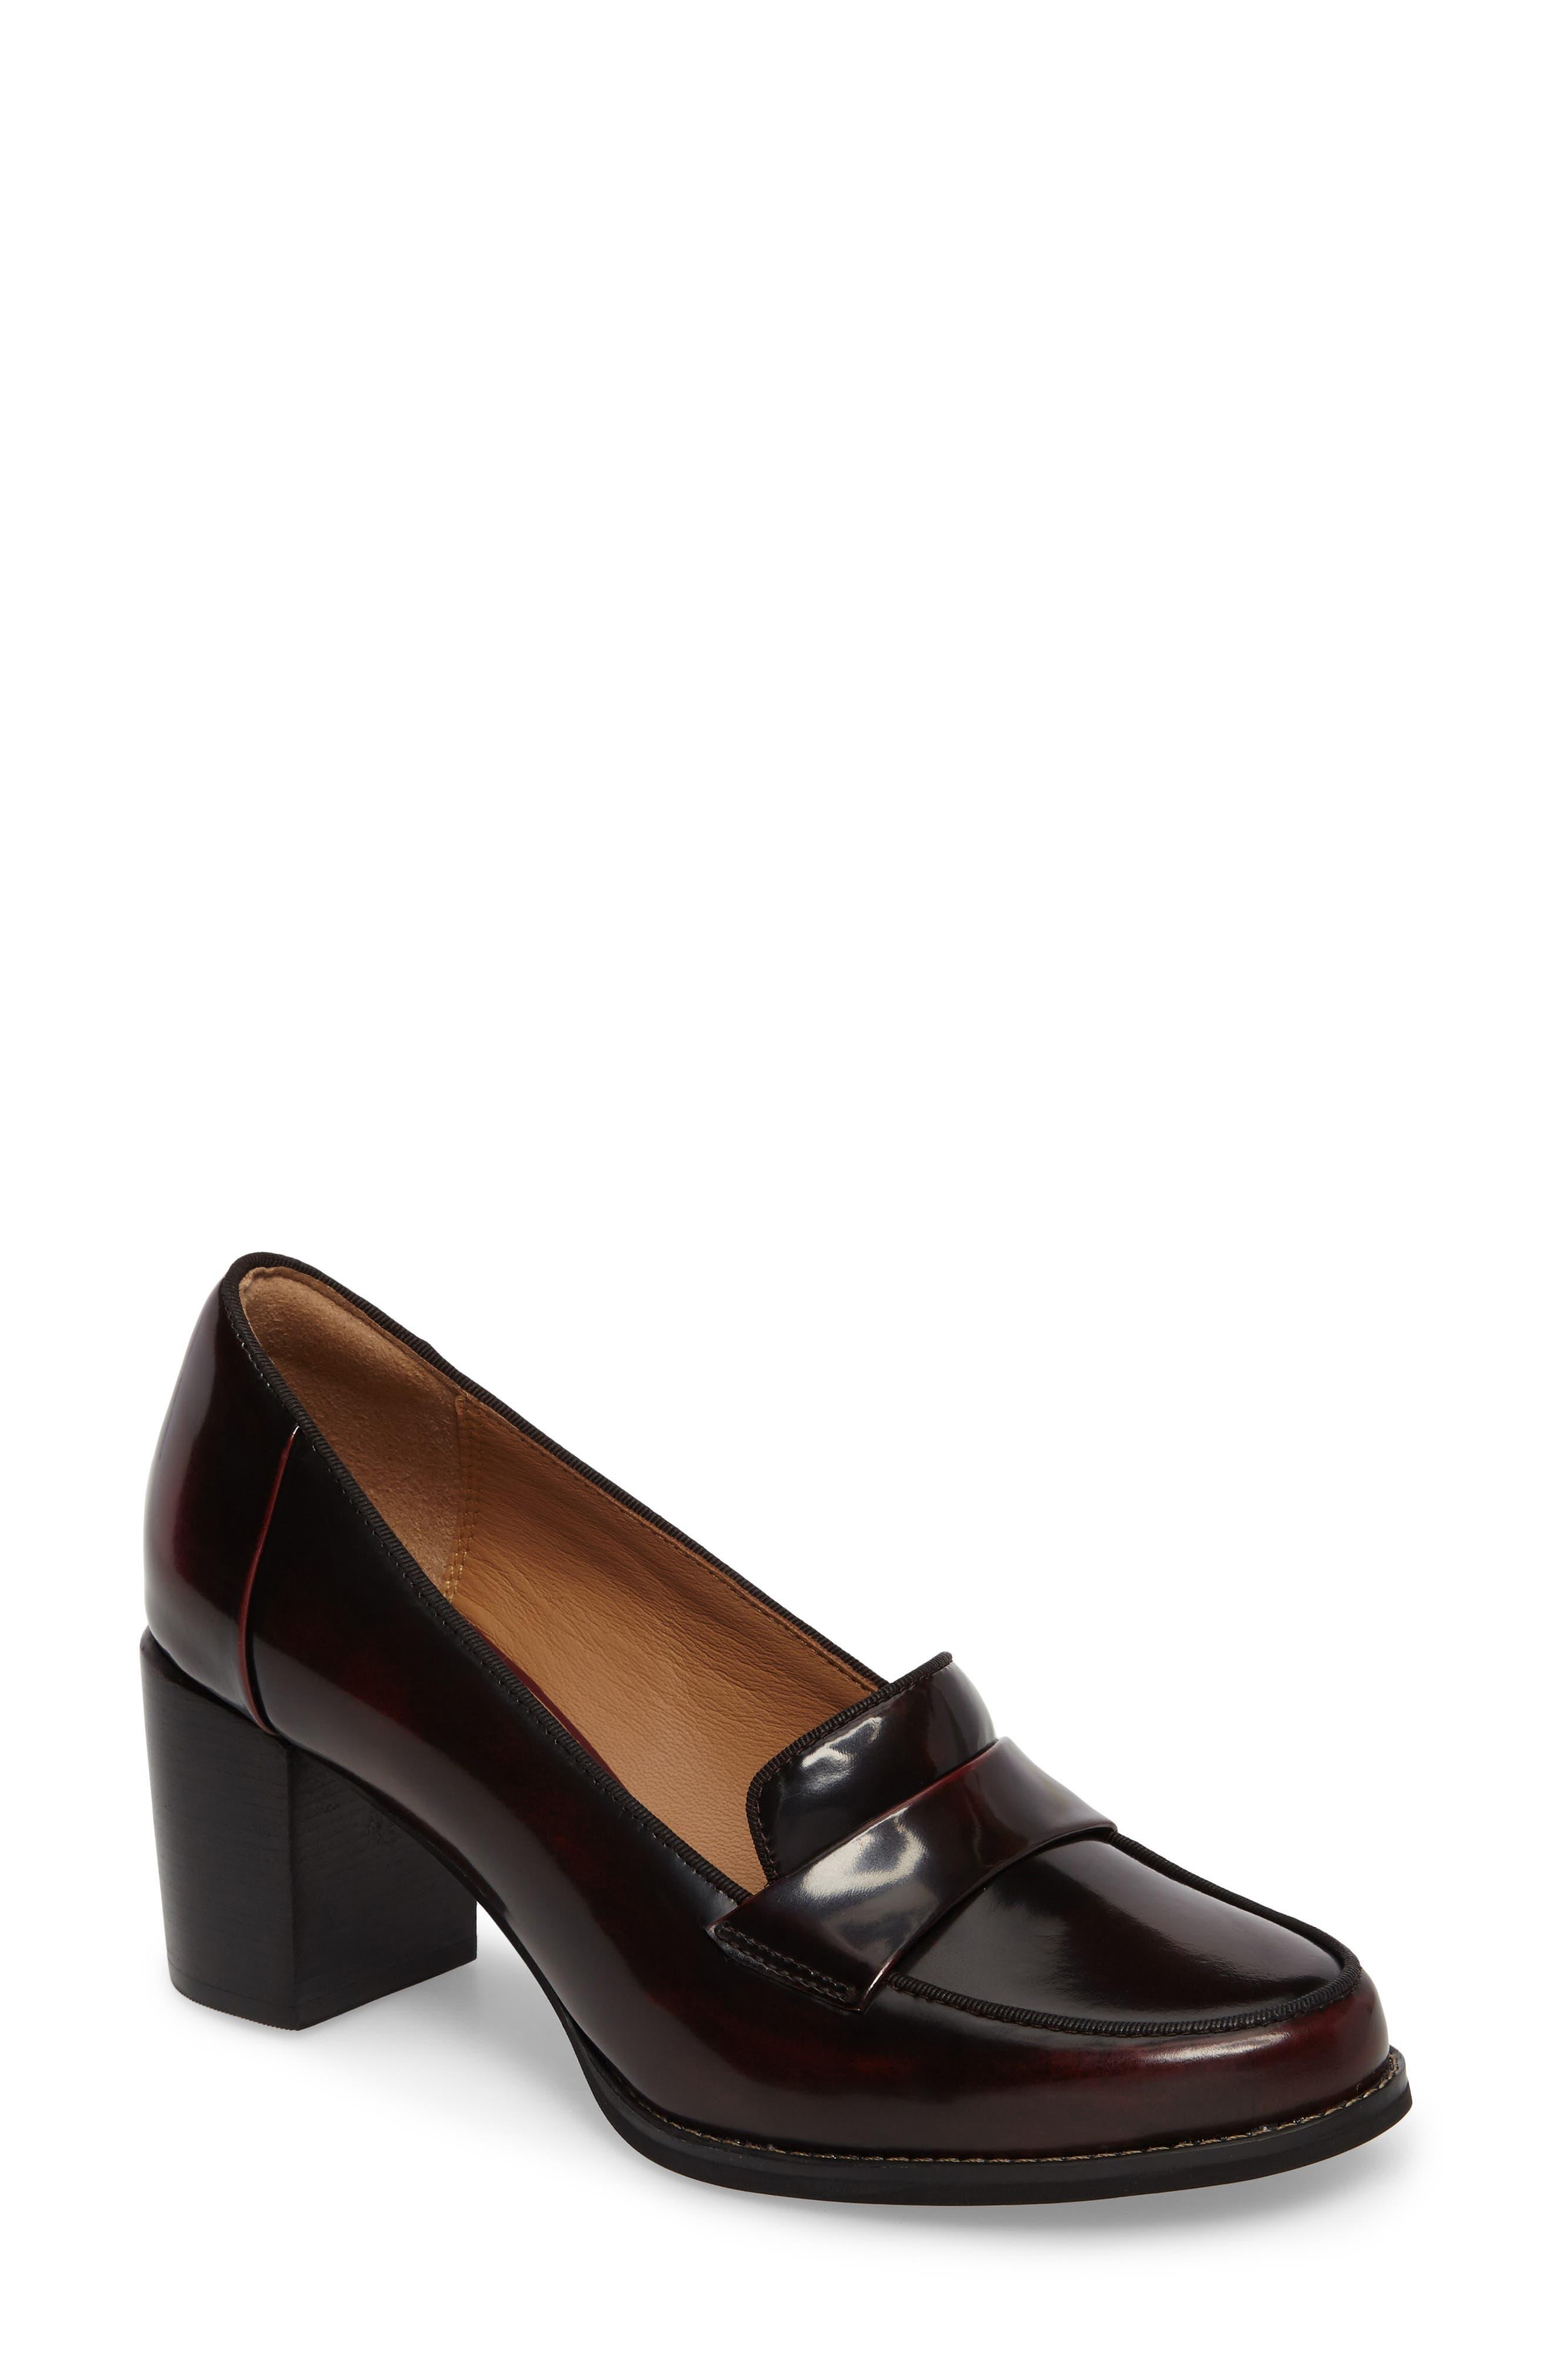 Tarah Grace Pump,                             Main thumbnail 1, color,                             Burgundy Leather